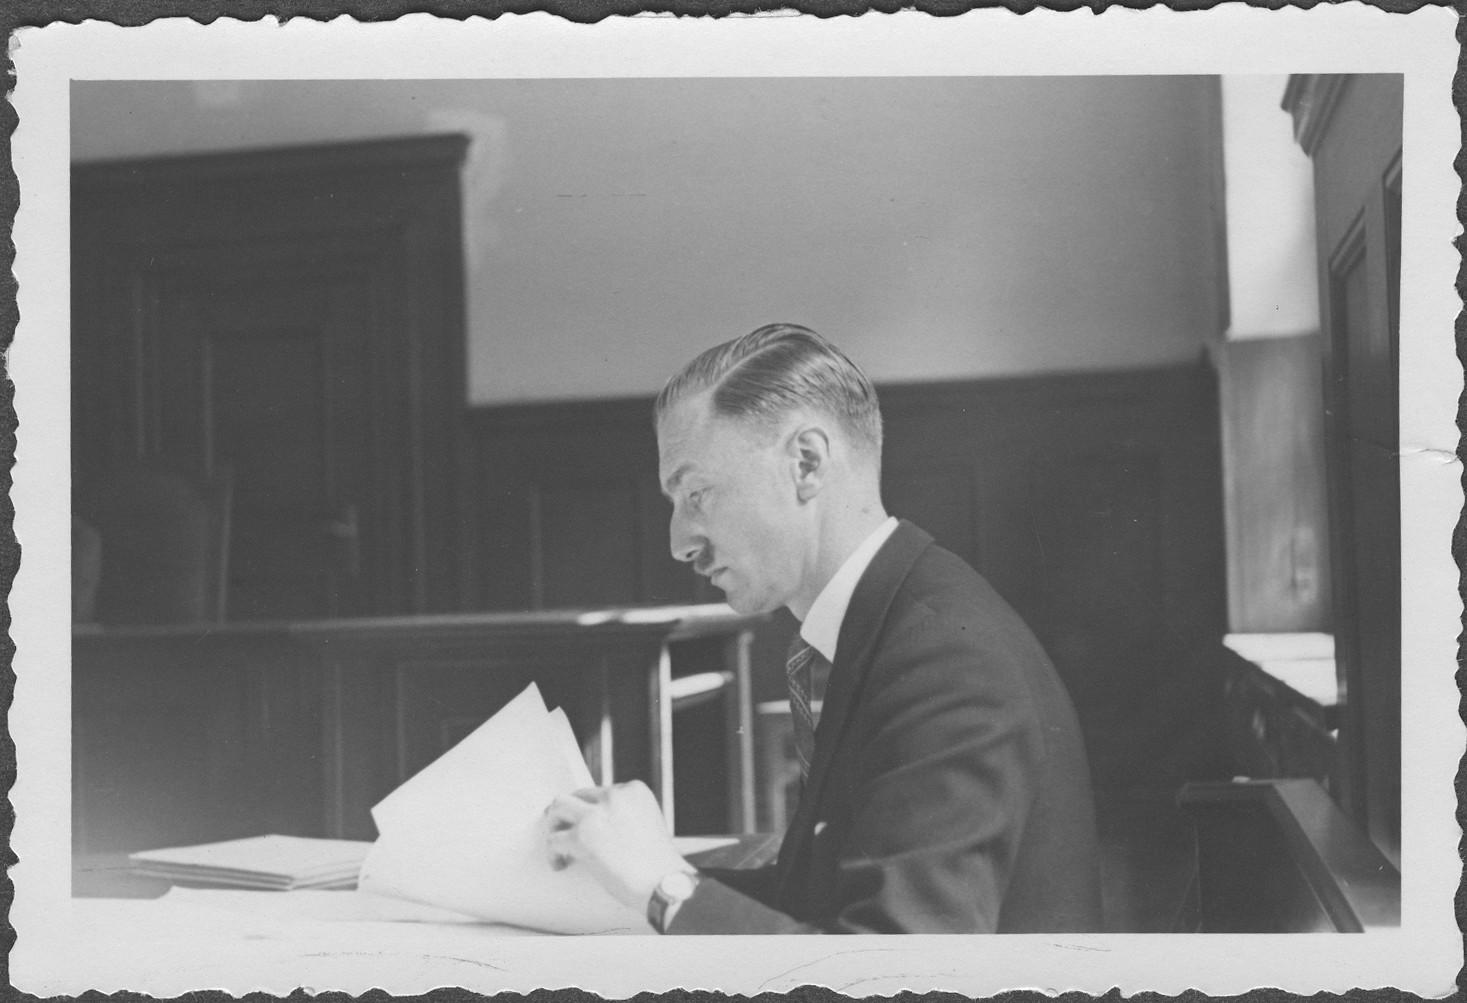 Portrait of J. Harcourt Barrington, British prosecutor at the IMT Nuremberg commission hearings investigating indicted Nazi organizations.